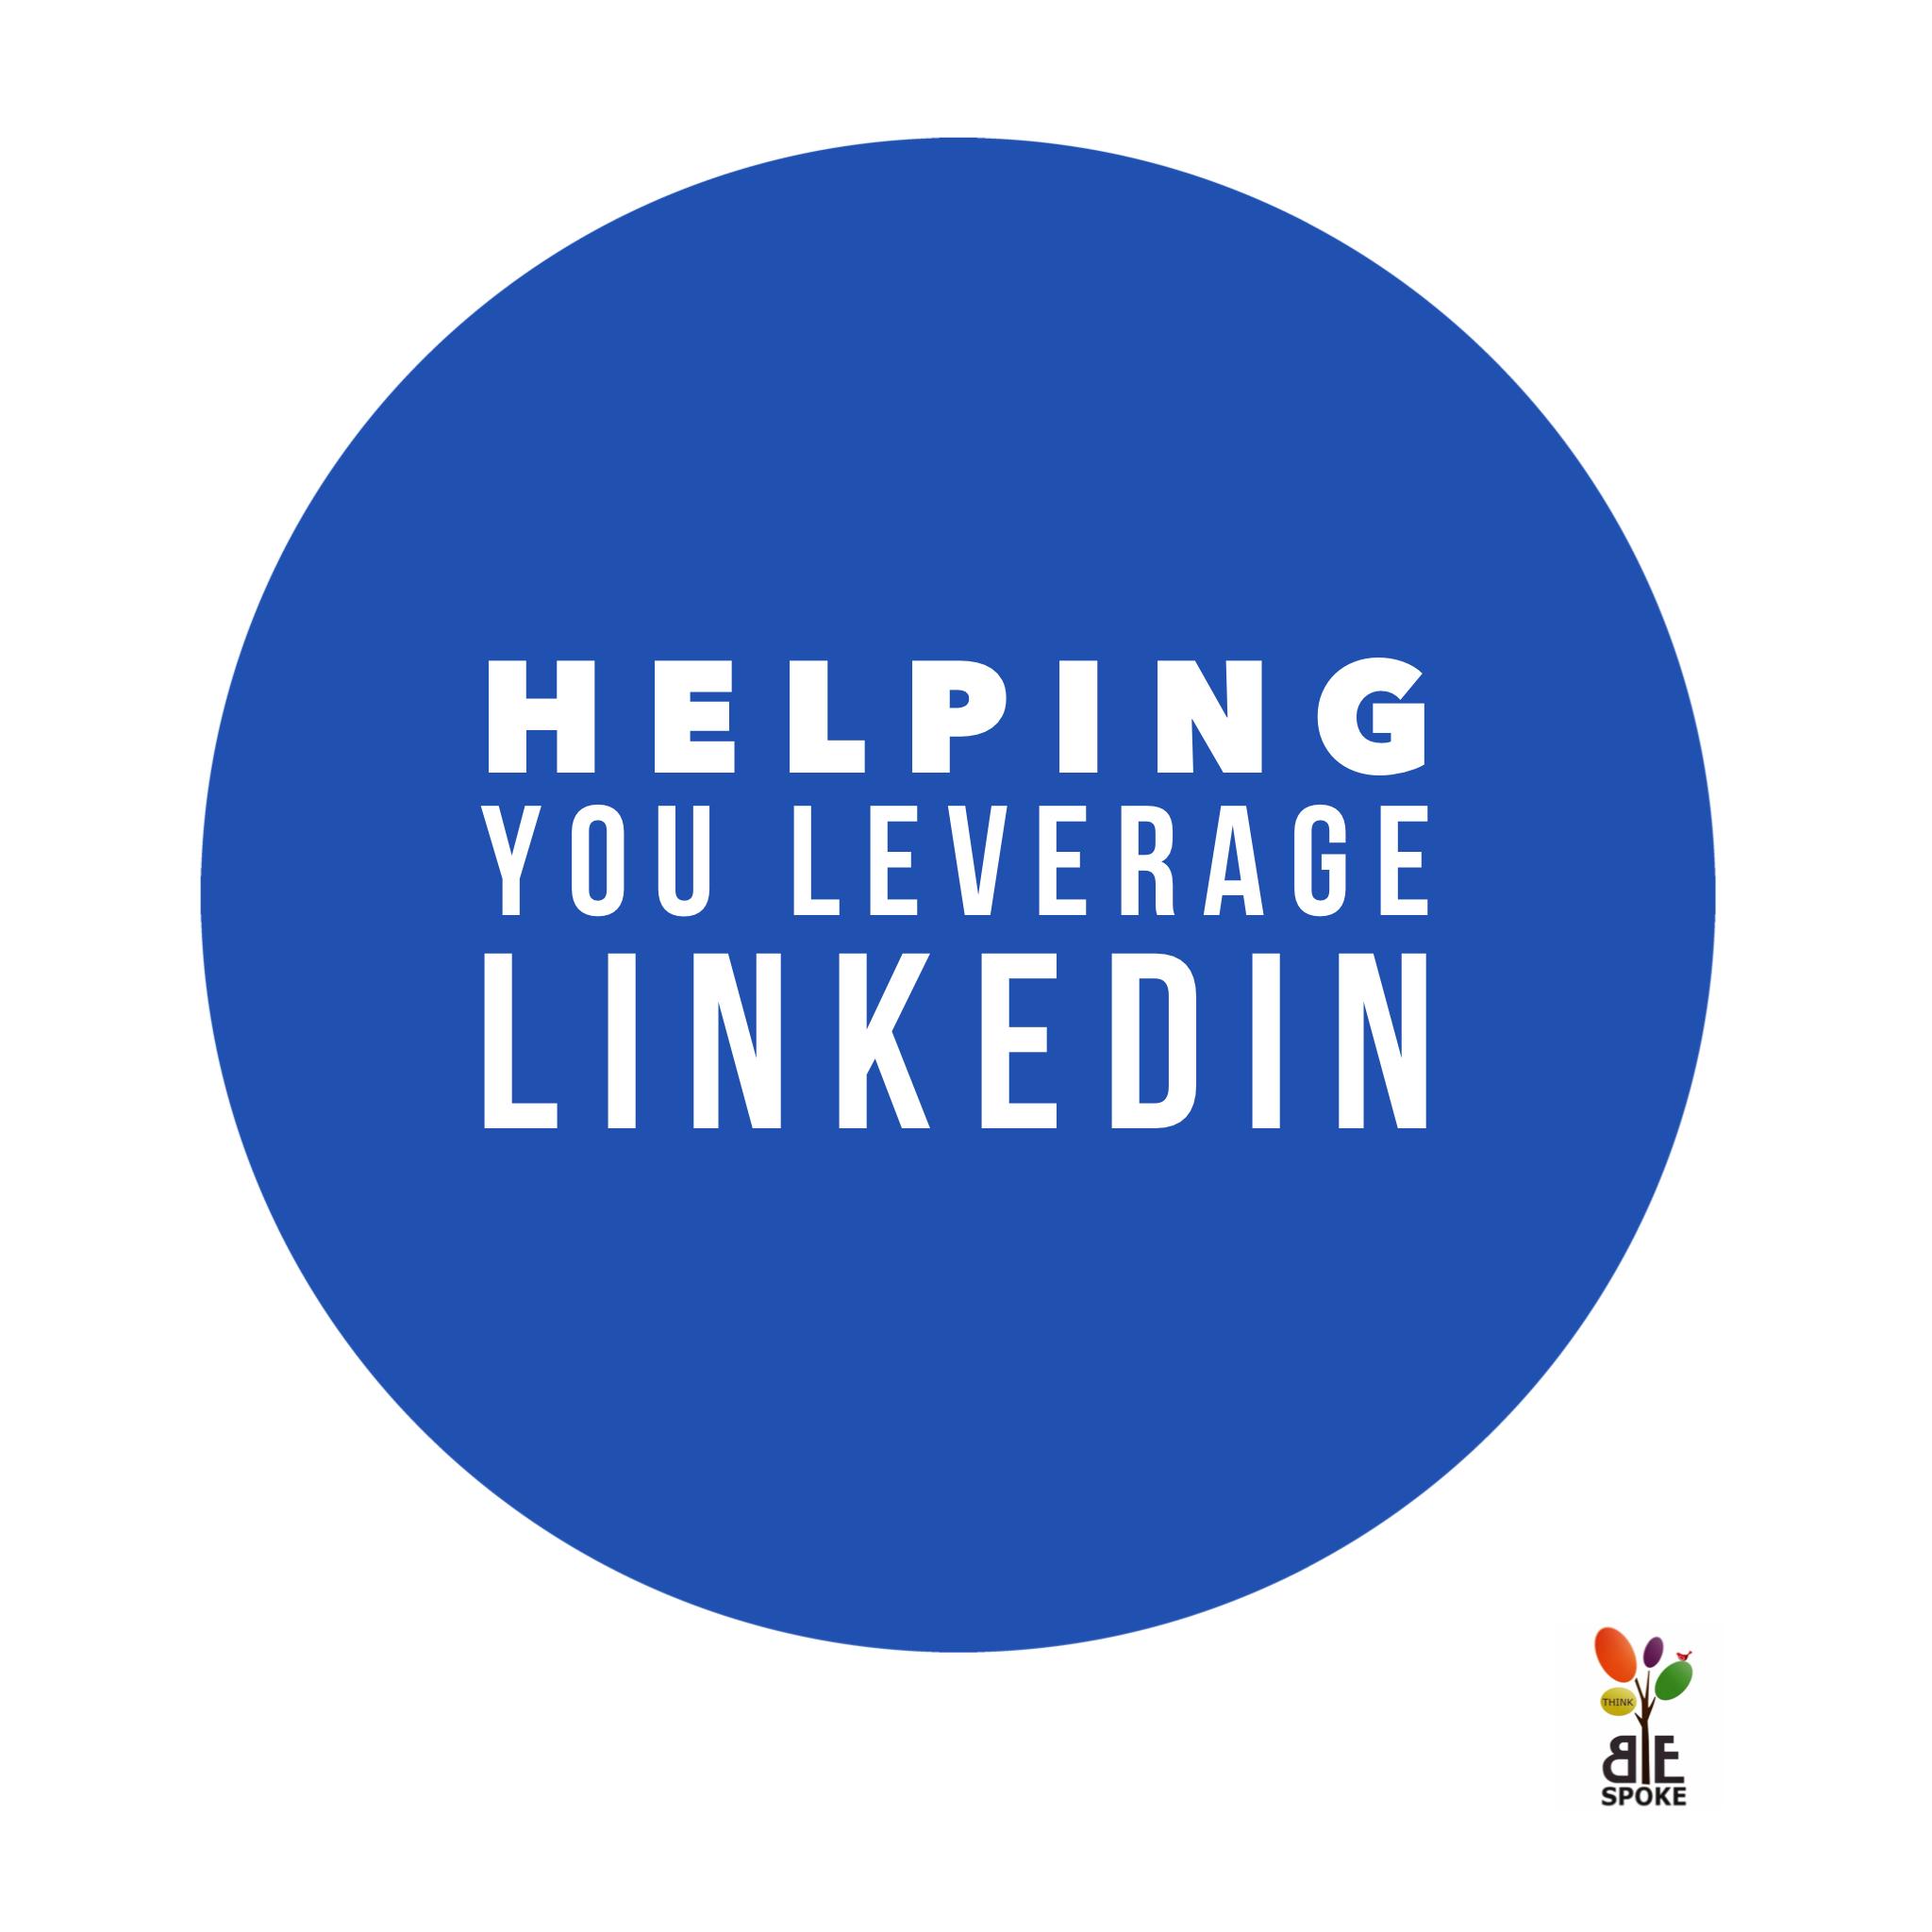 helping you leverage linkedin